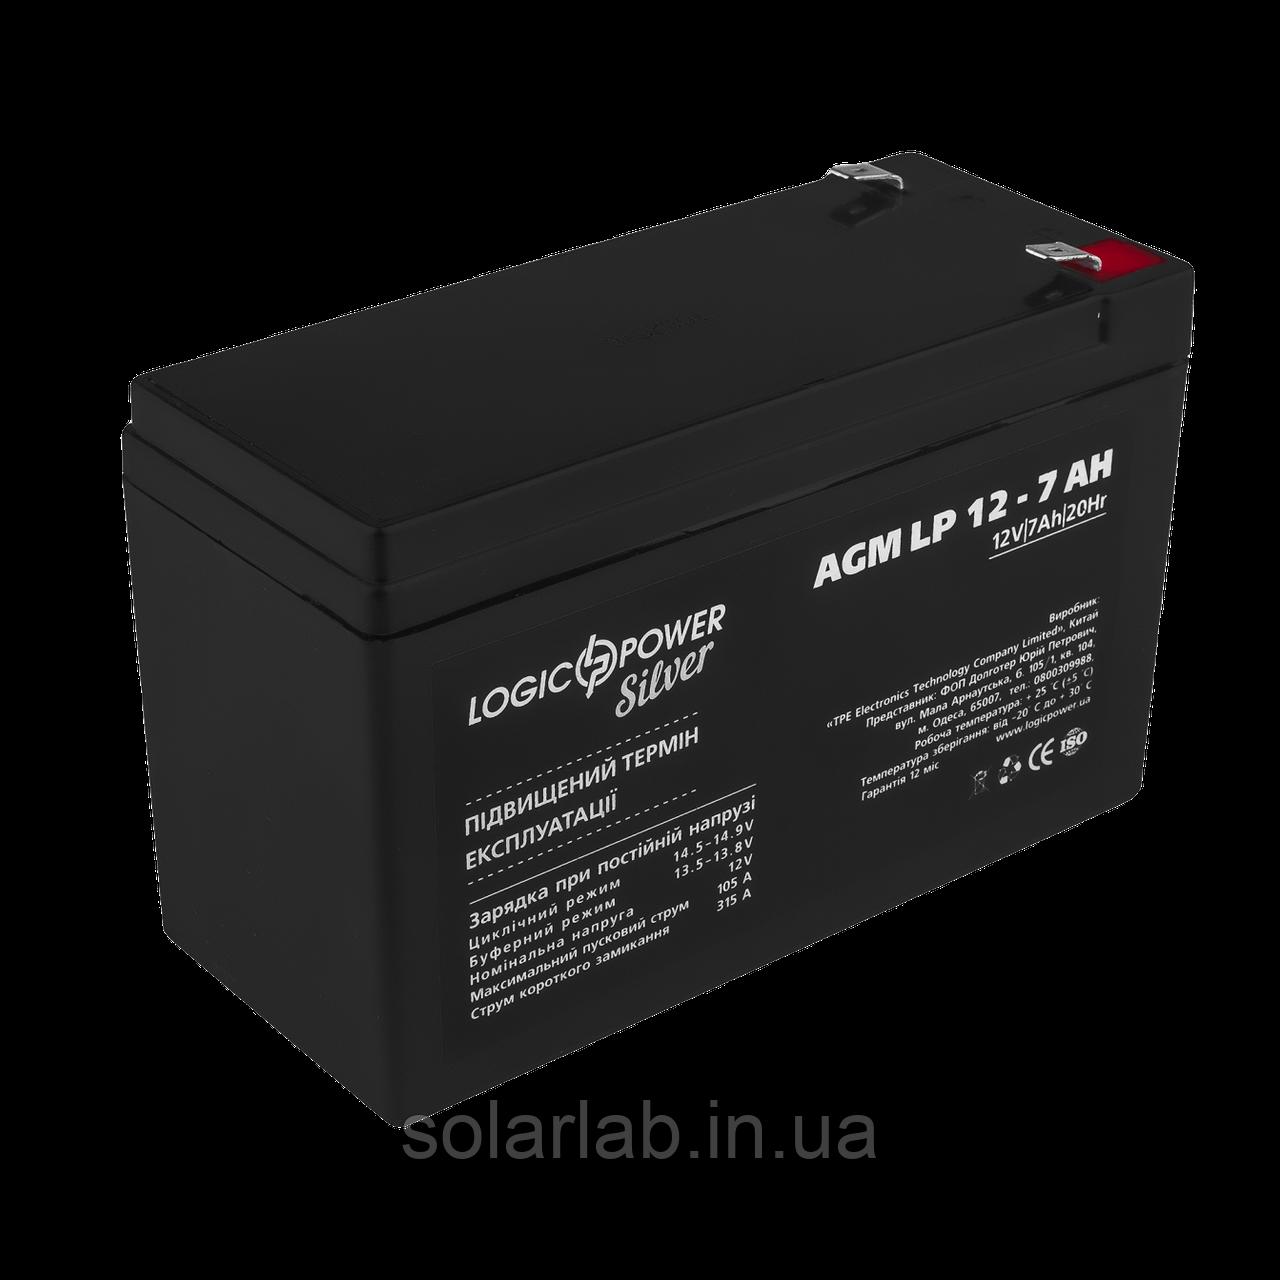 Аккумулятор кислотный AGM LogicPower LP 12 - 7,0 AH SILVER